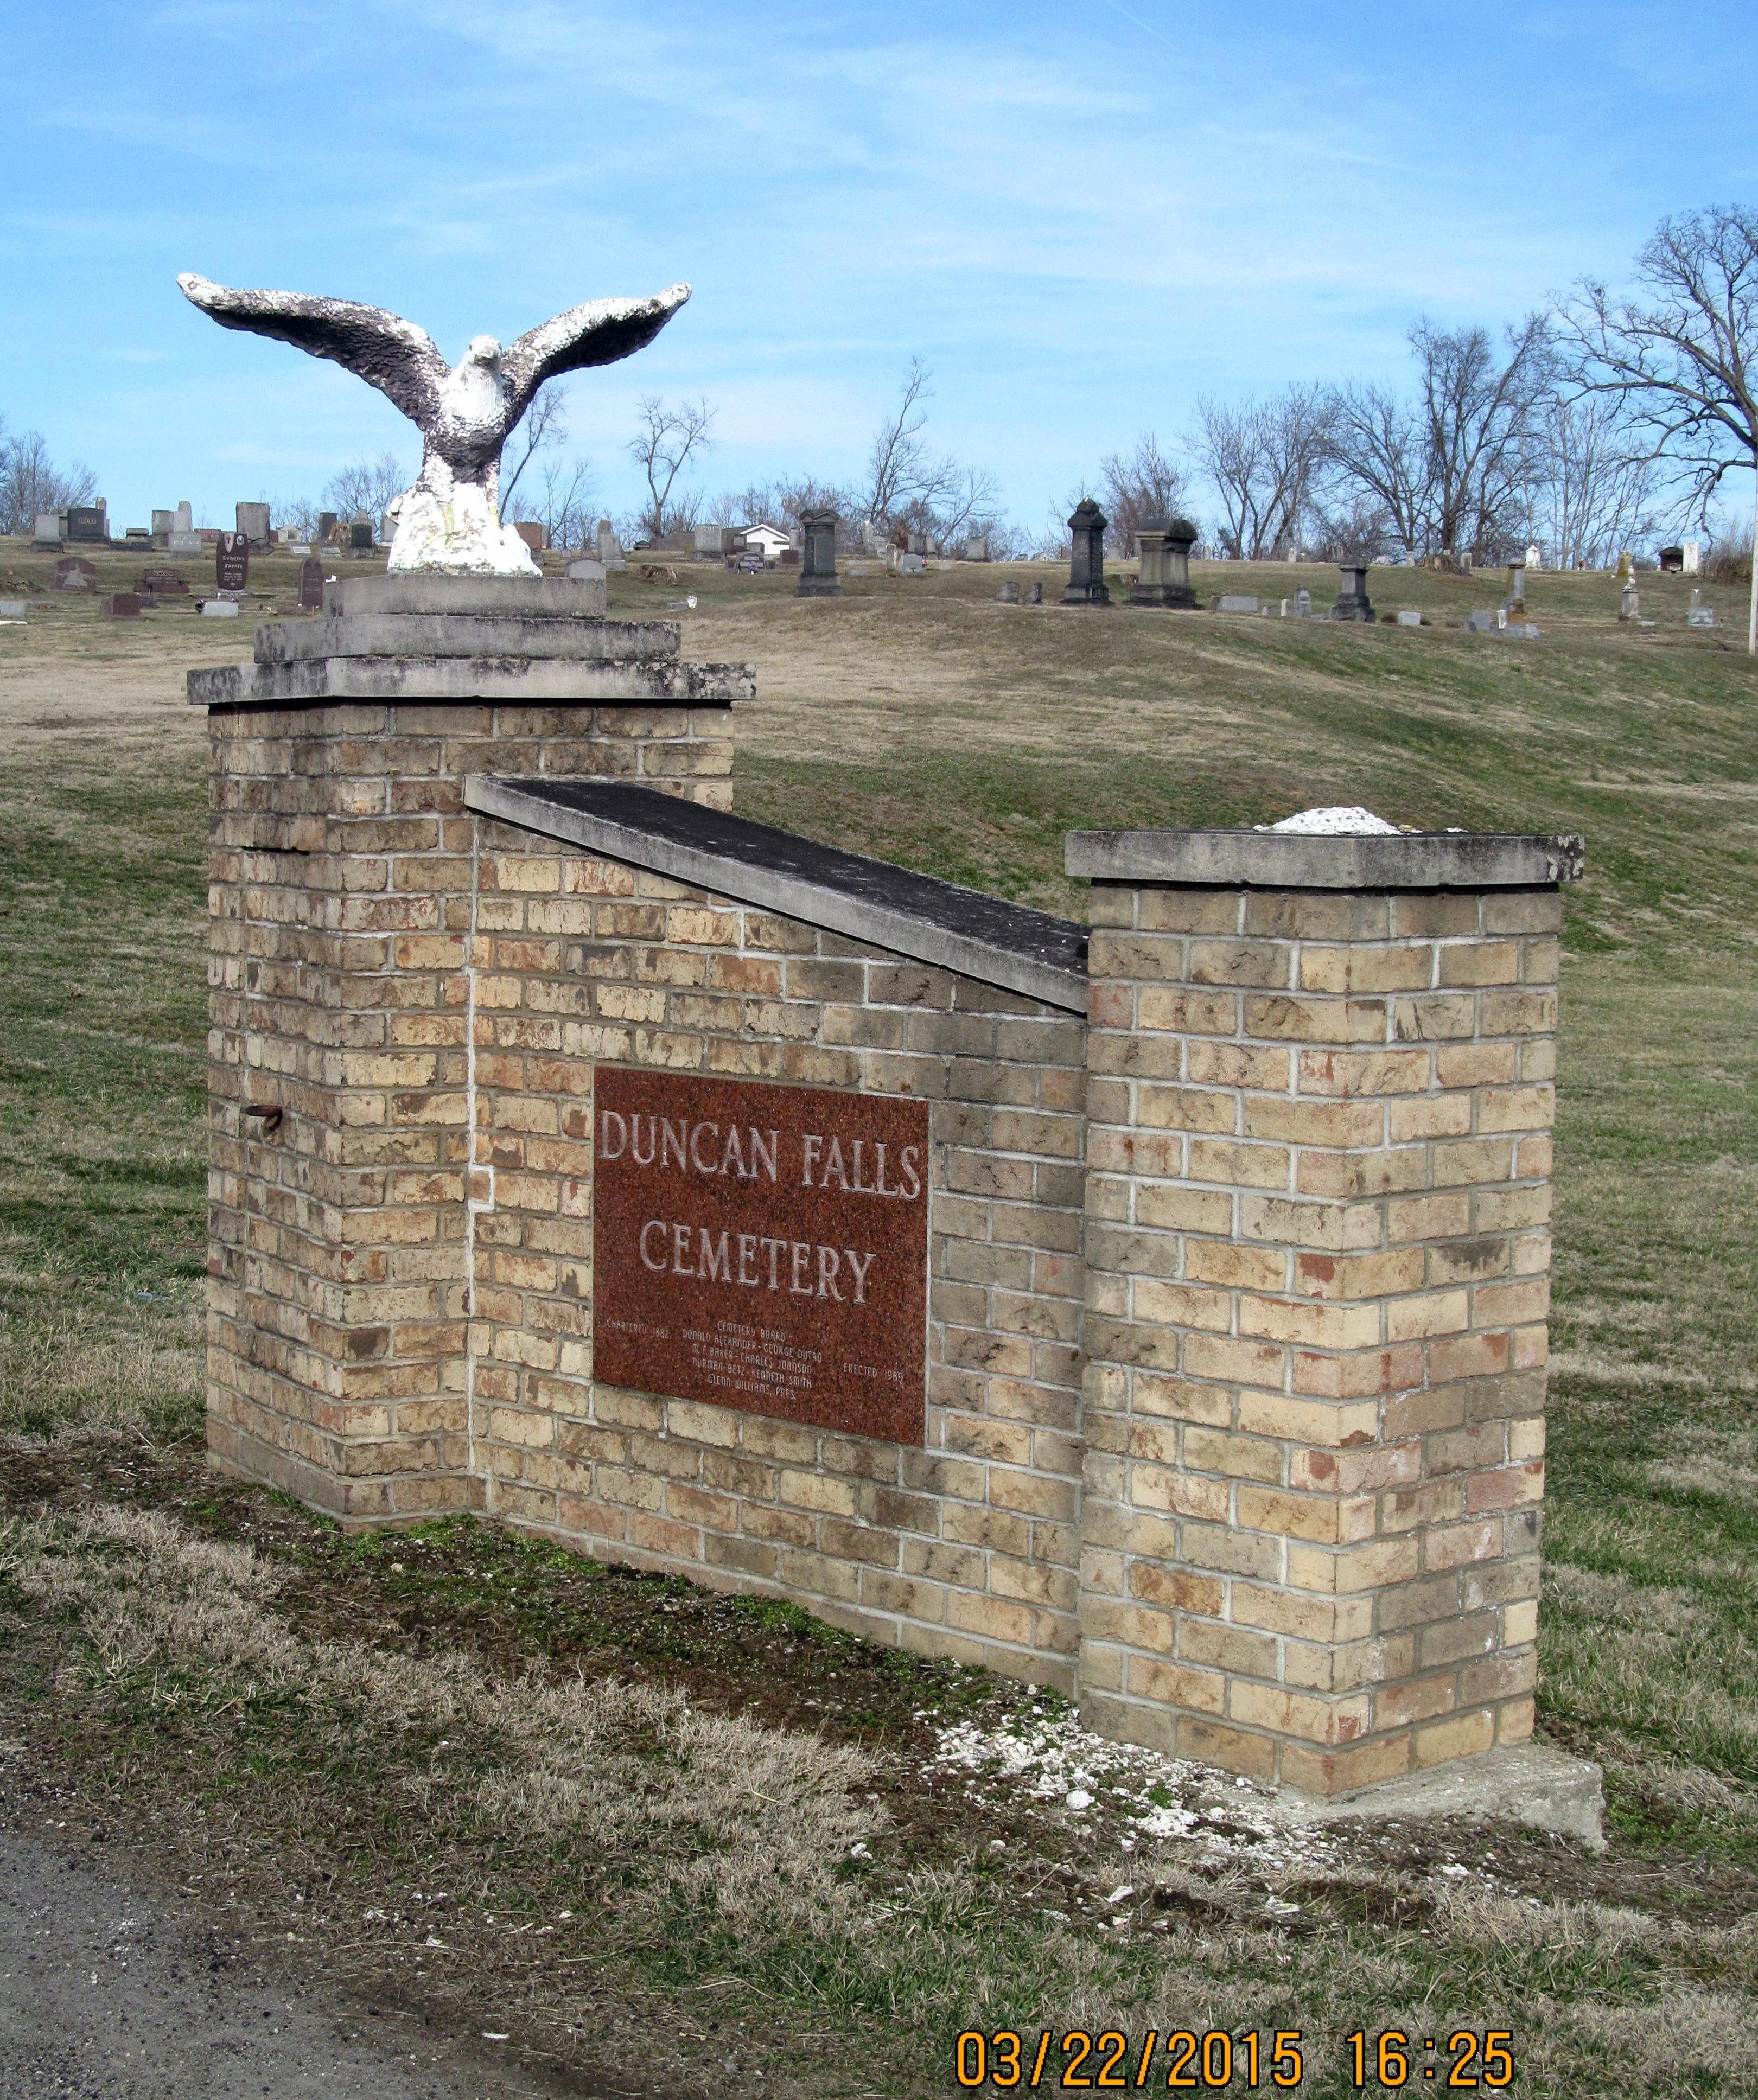 Duncan Falls Cemetery